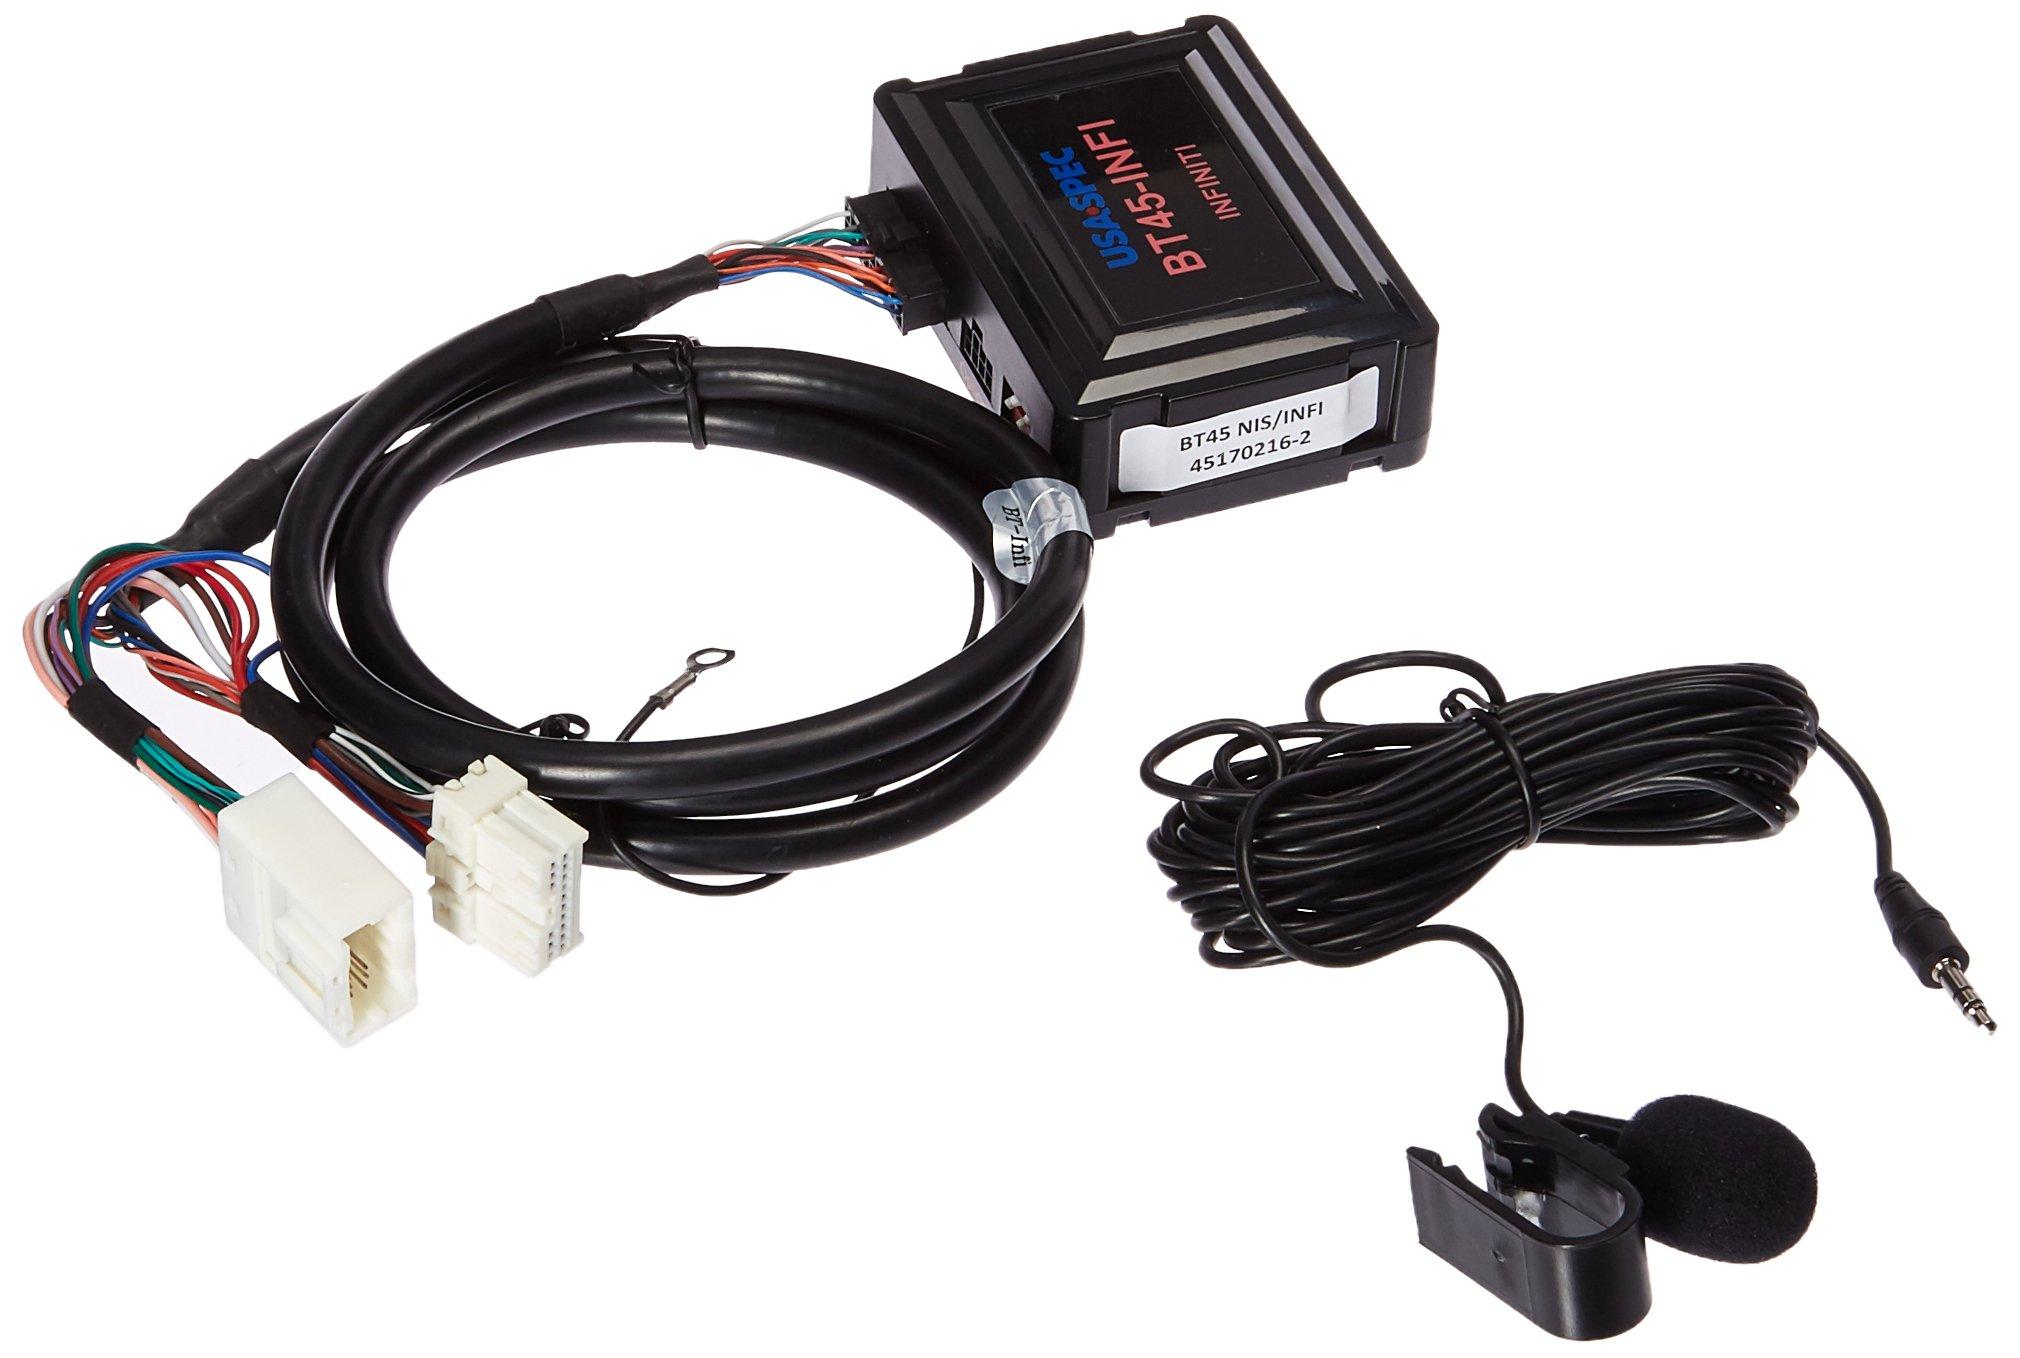 USA SPEC BT45-INFI Bluetooth Phone, Music & AUX Input Kit for Select 2003-2012 Infiniti Nissan Models